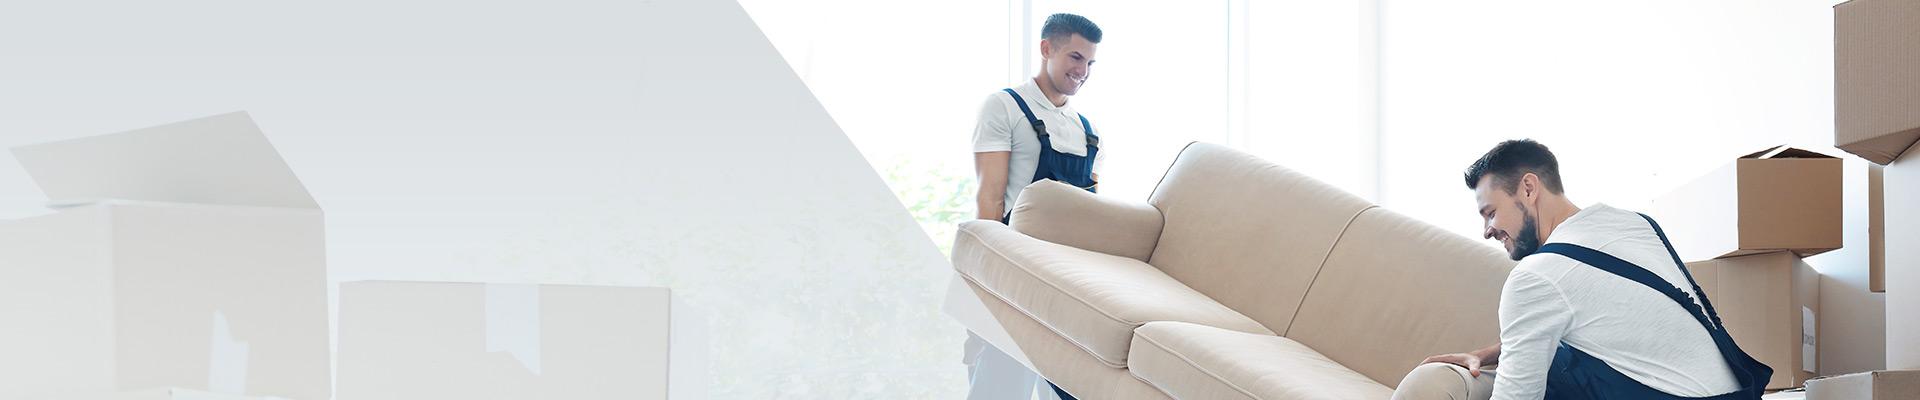 Möbelpacker beim Sofa Transport